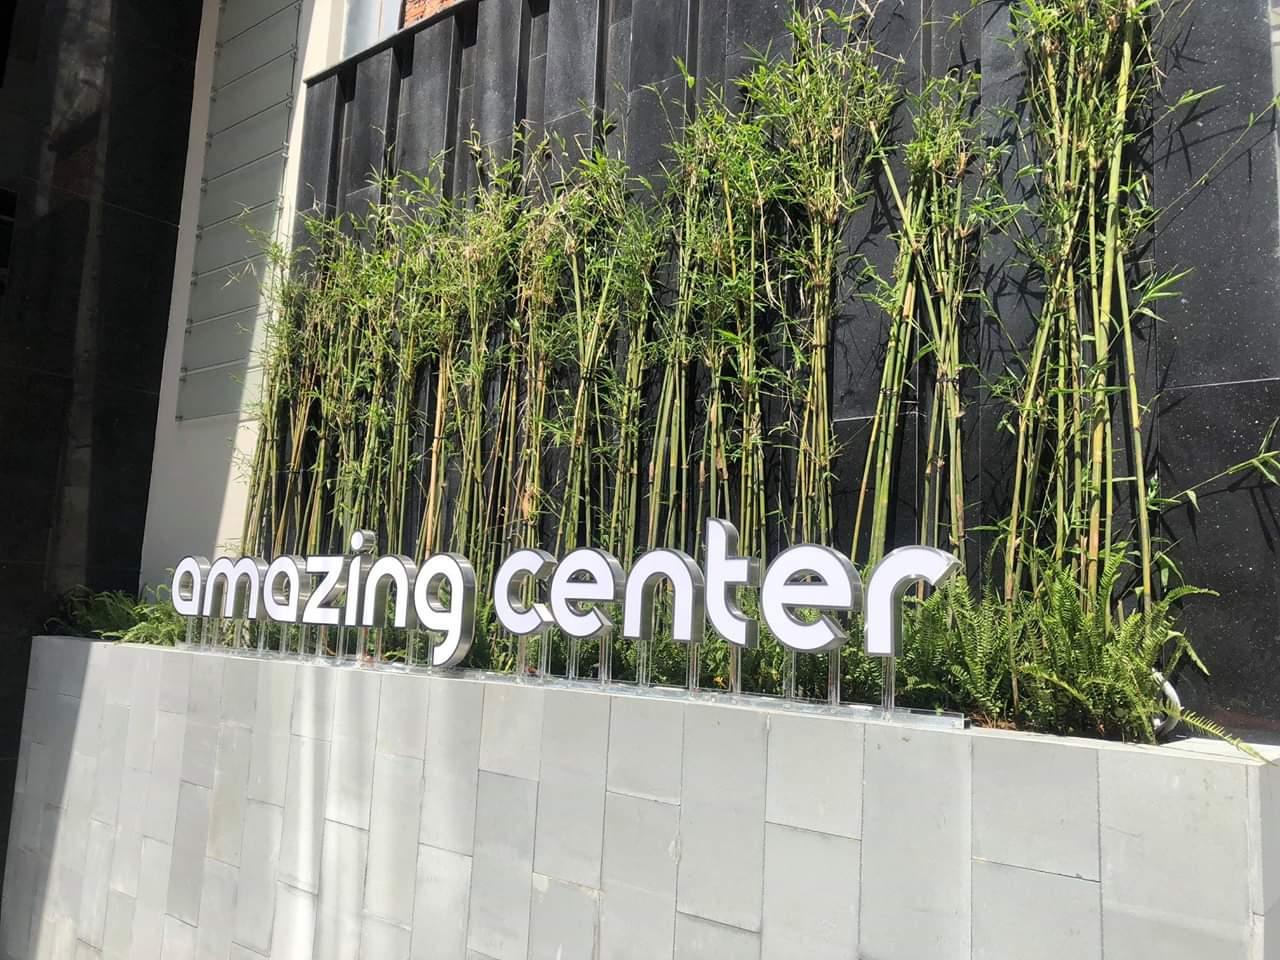 Amazing center